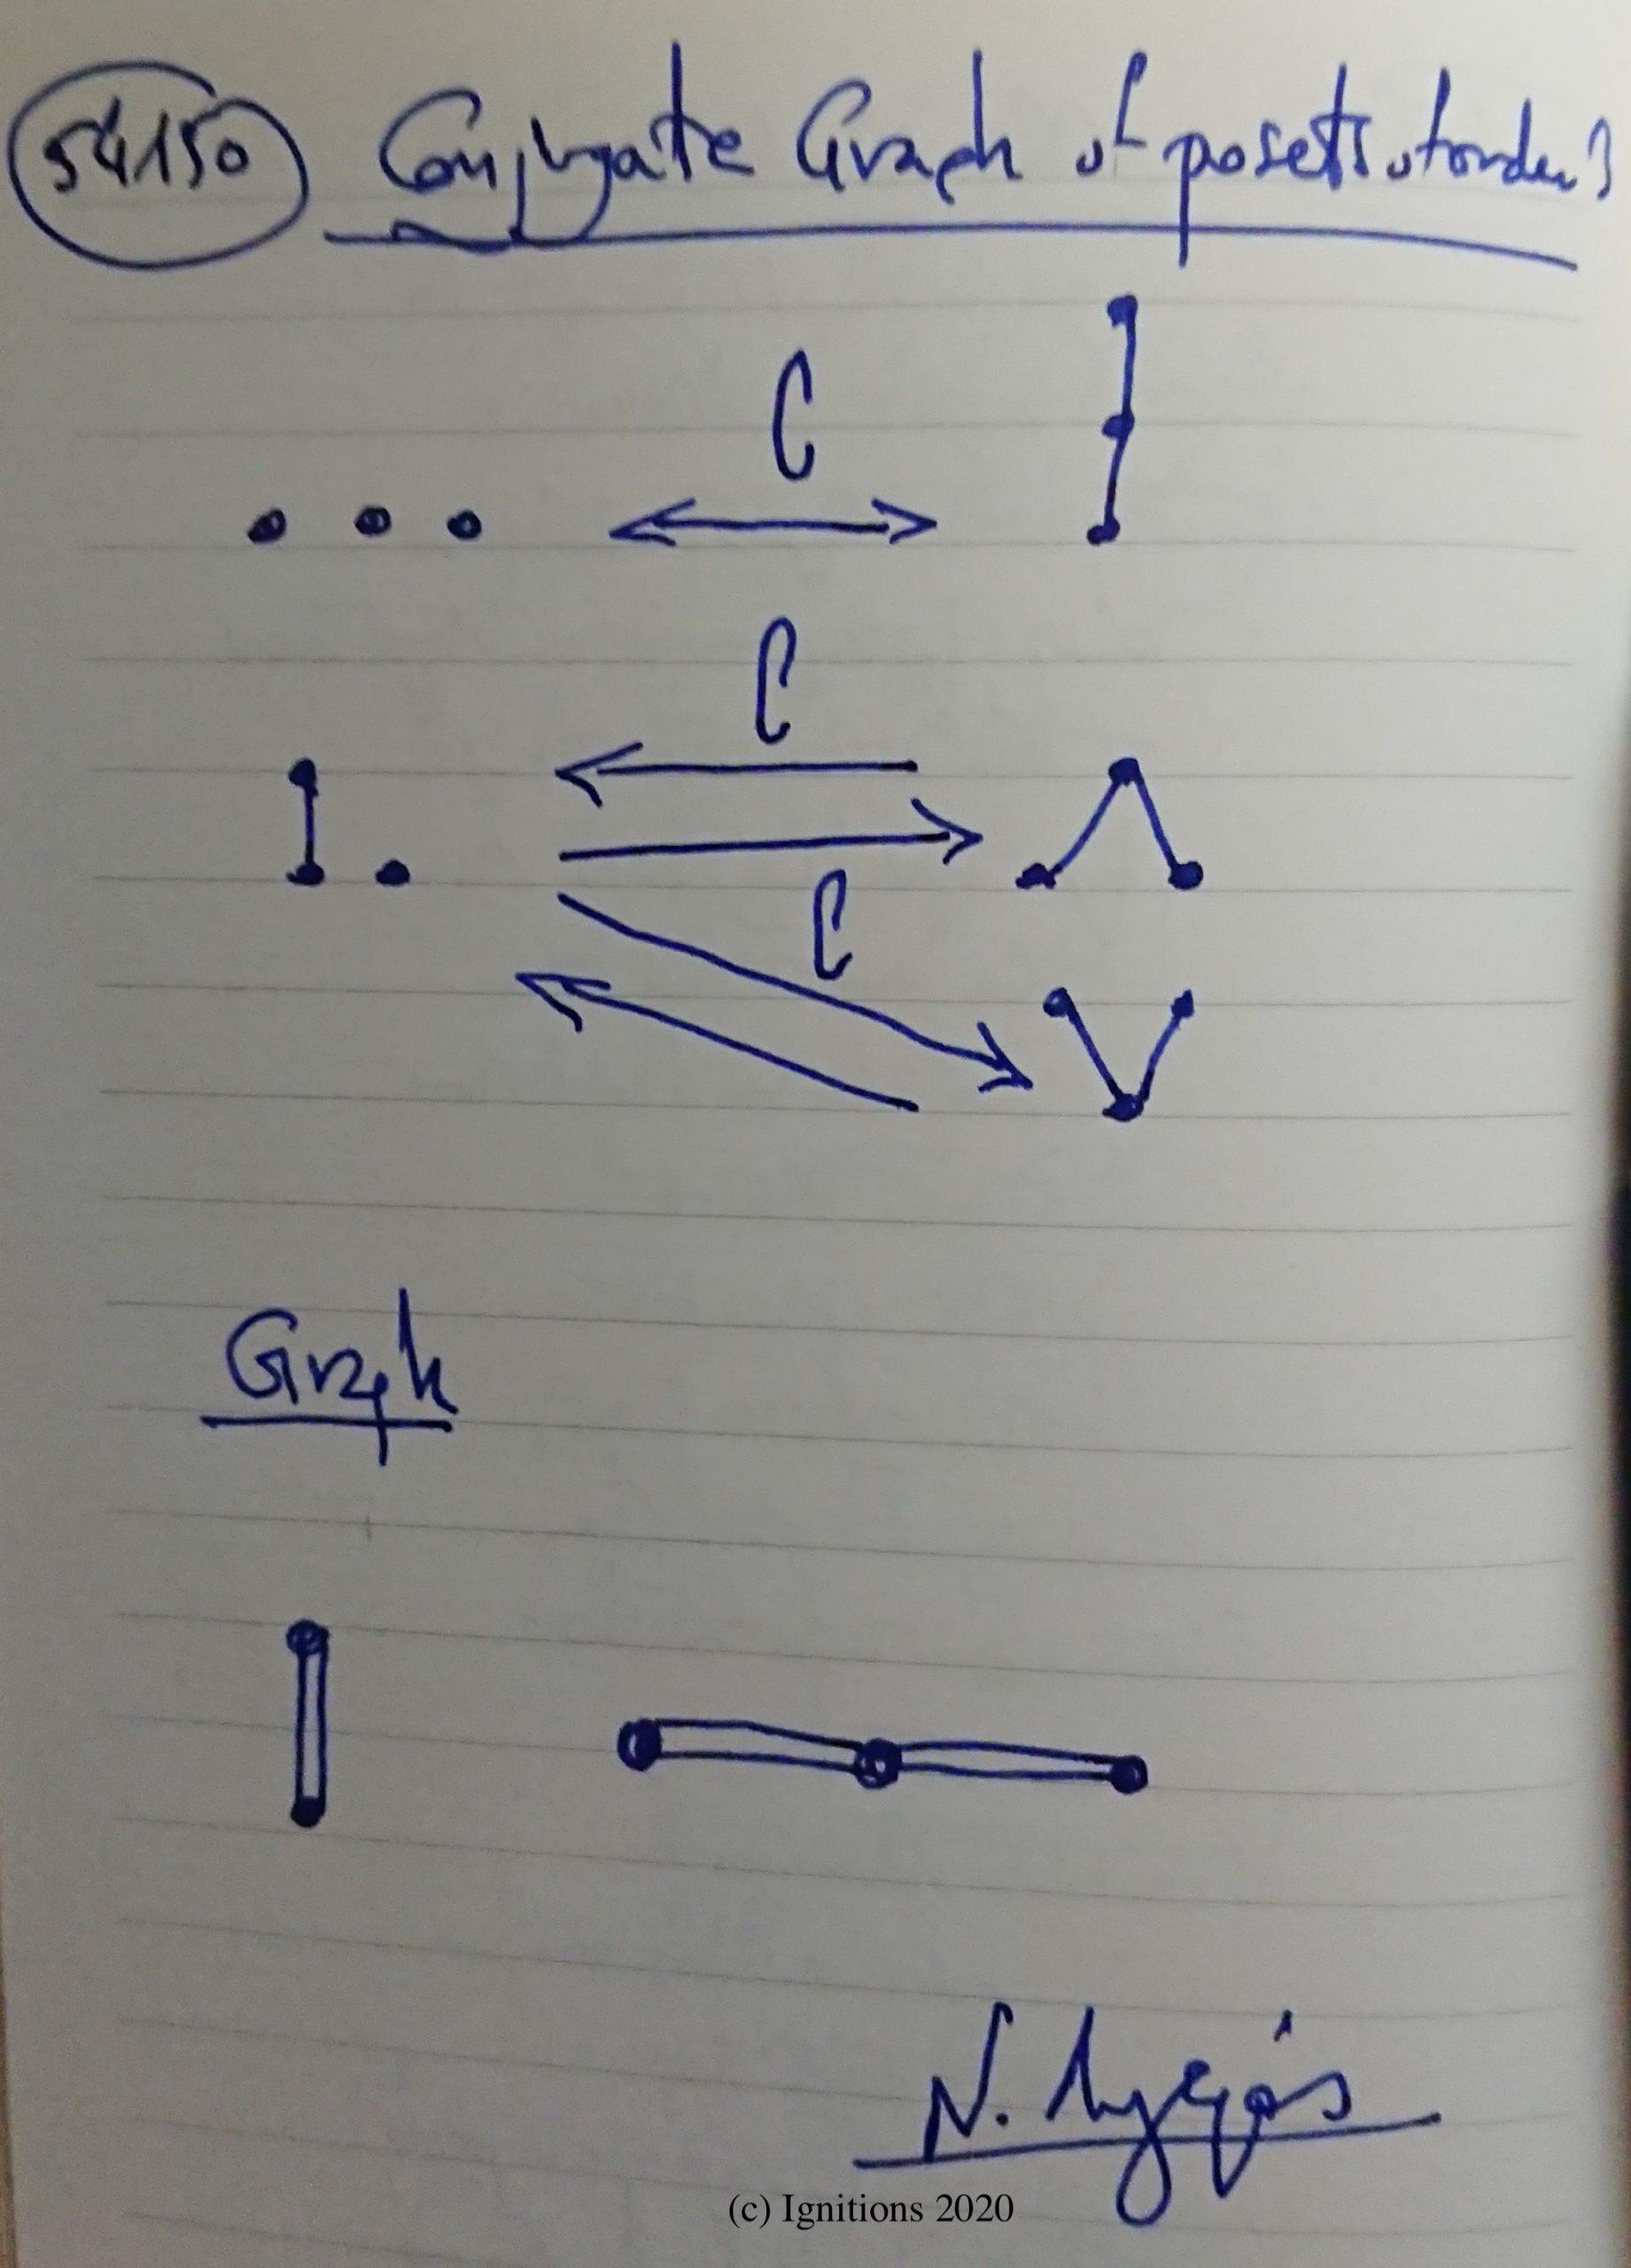 54150 - Conjugate Graph of posets of order 3. (Dessin)